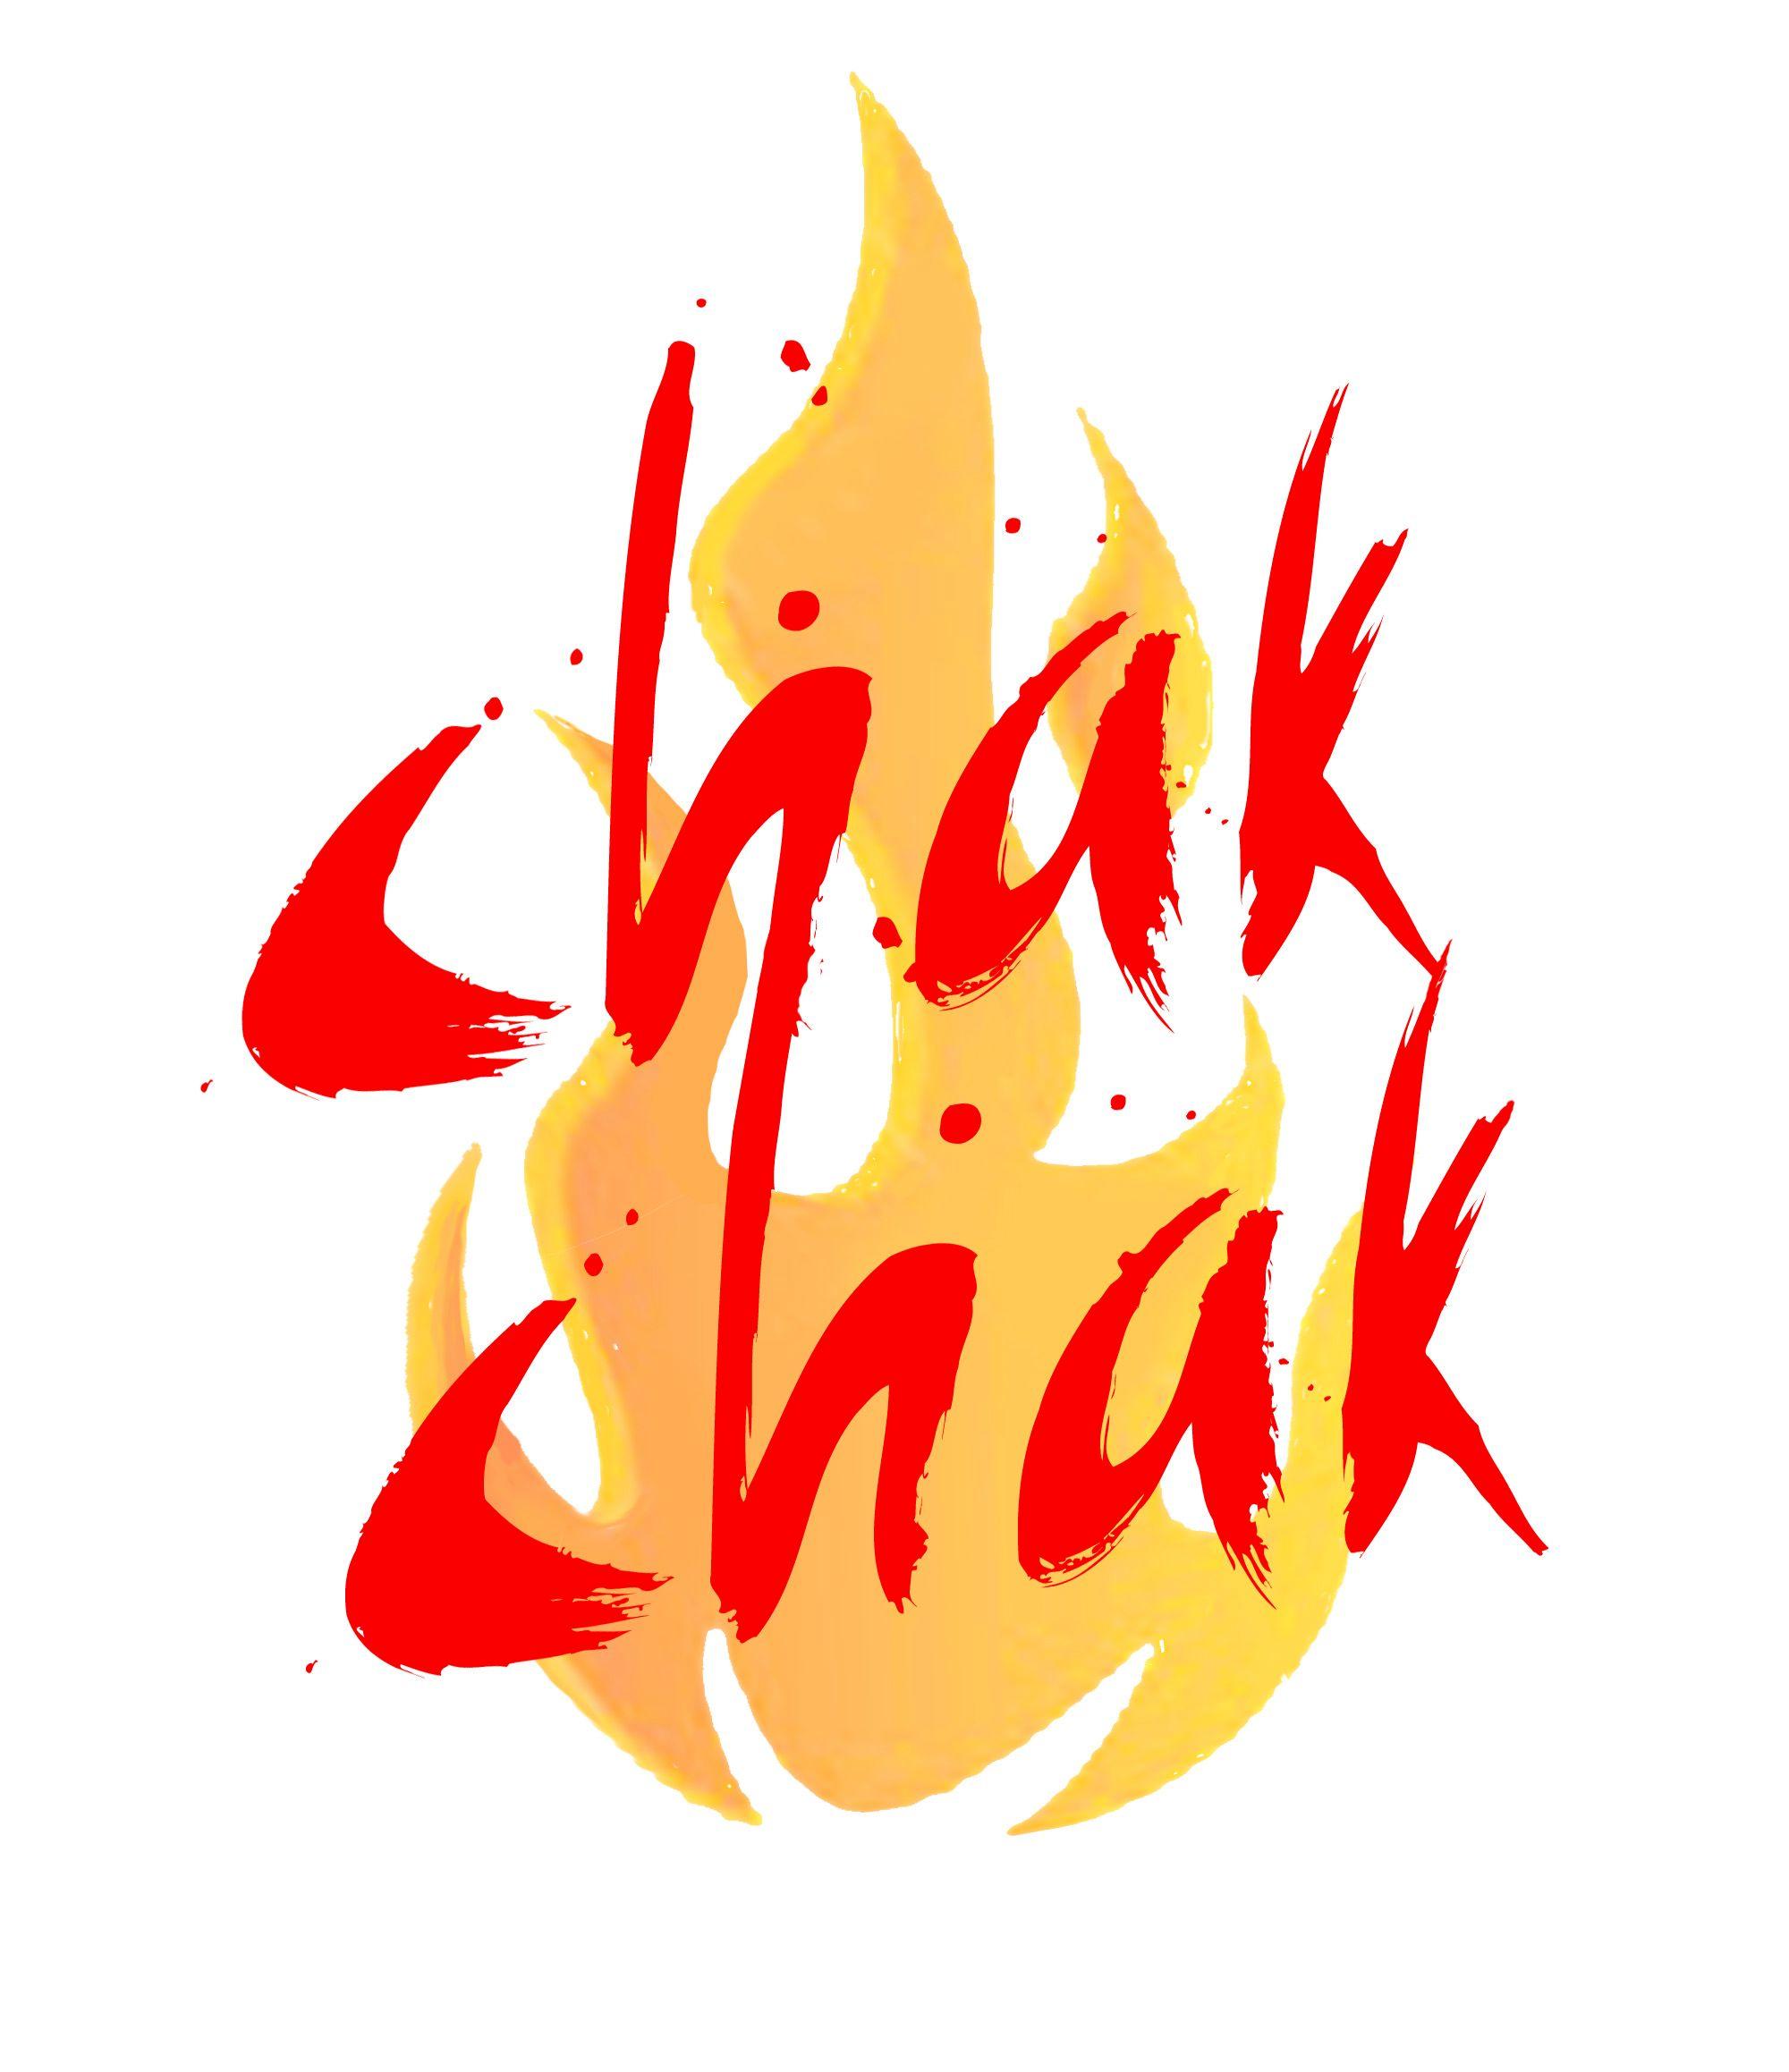 chakchak.de